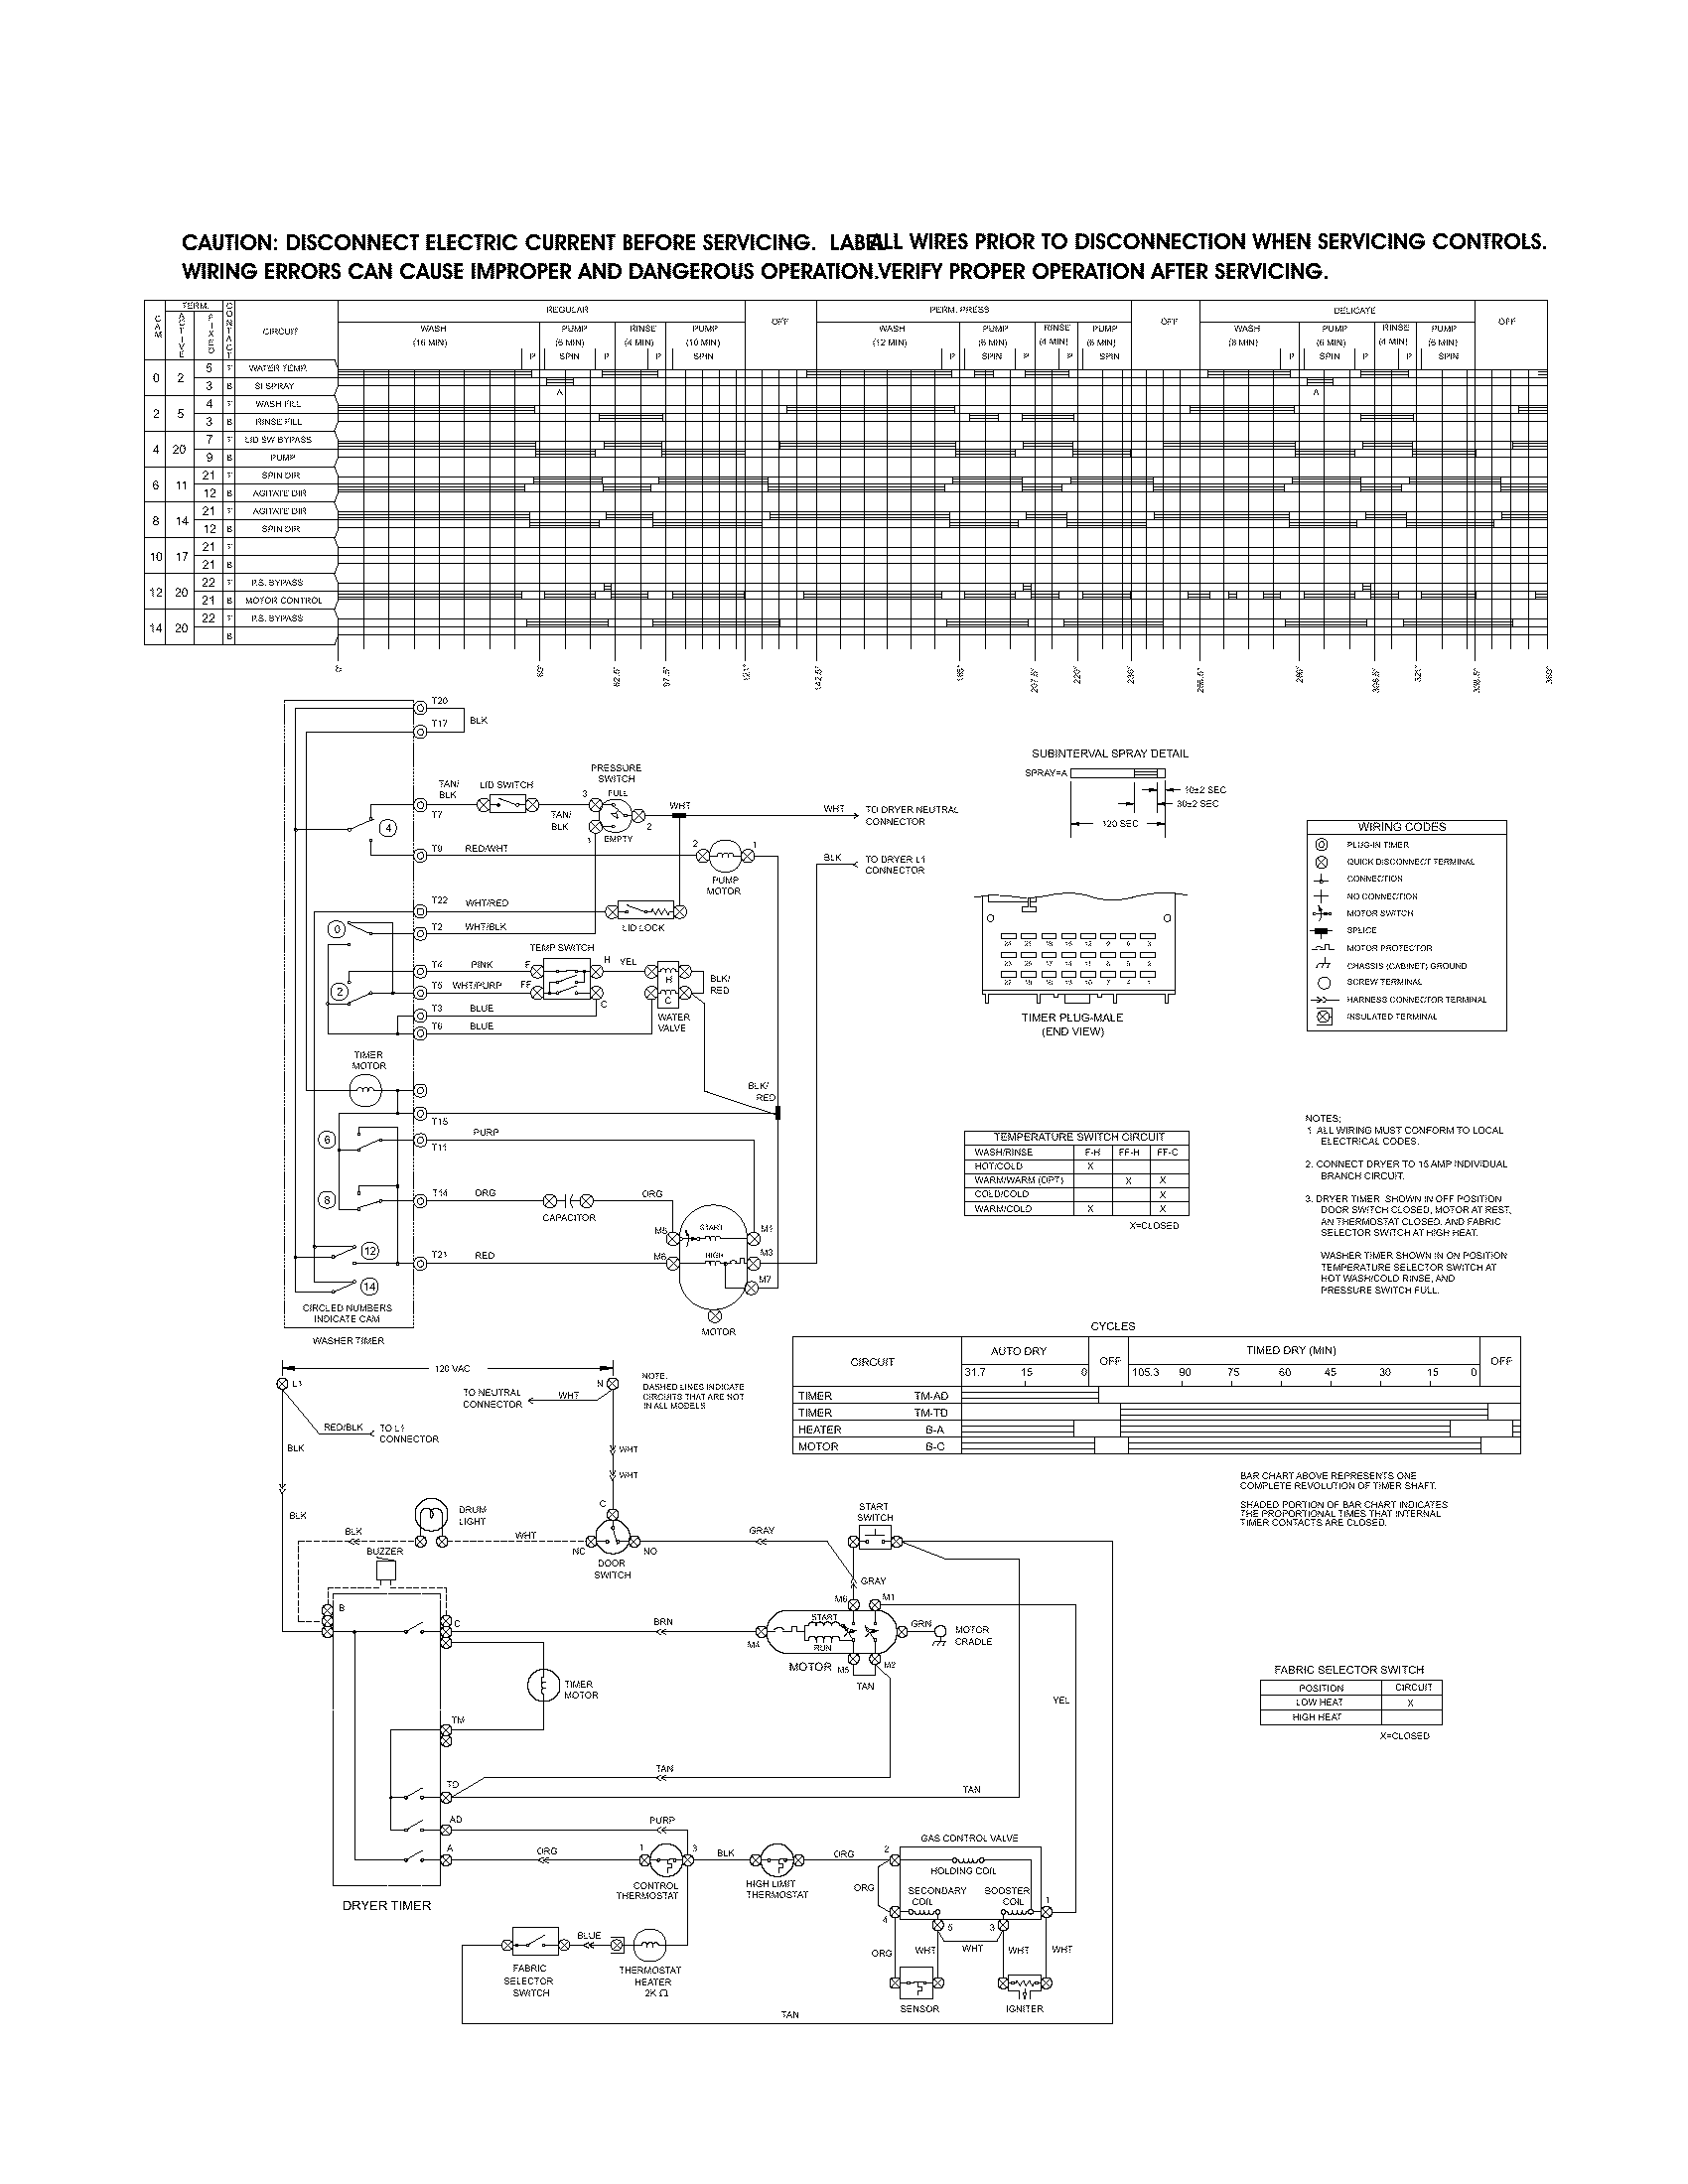 Frigidaire model FEZ831AS2 laundry centers/combos genuine